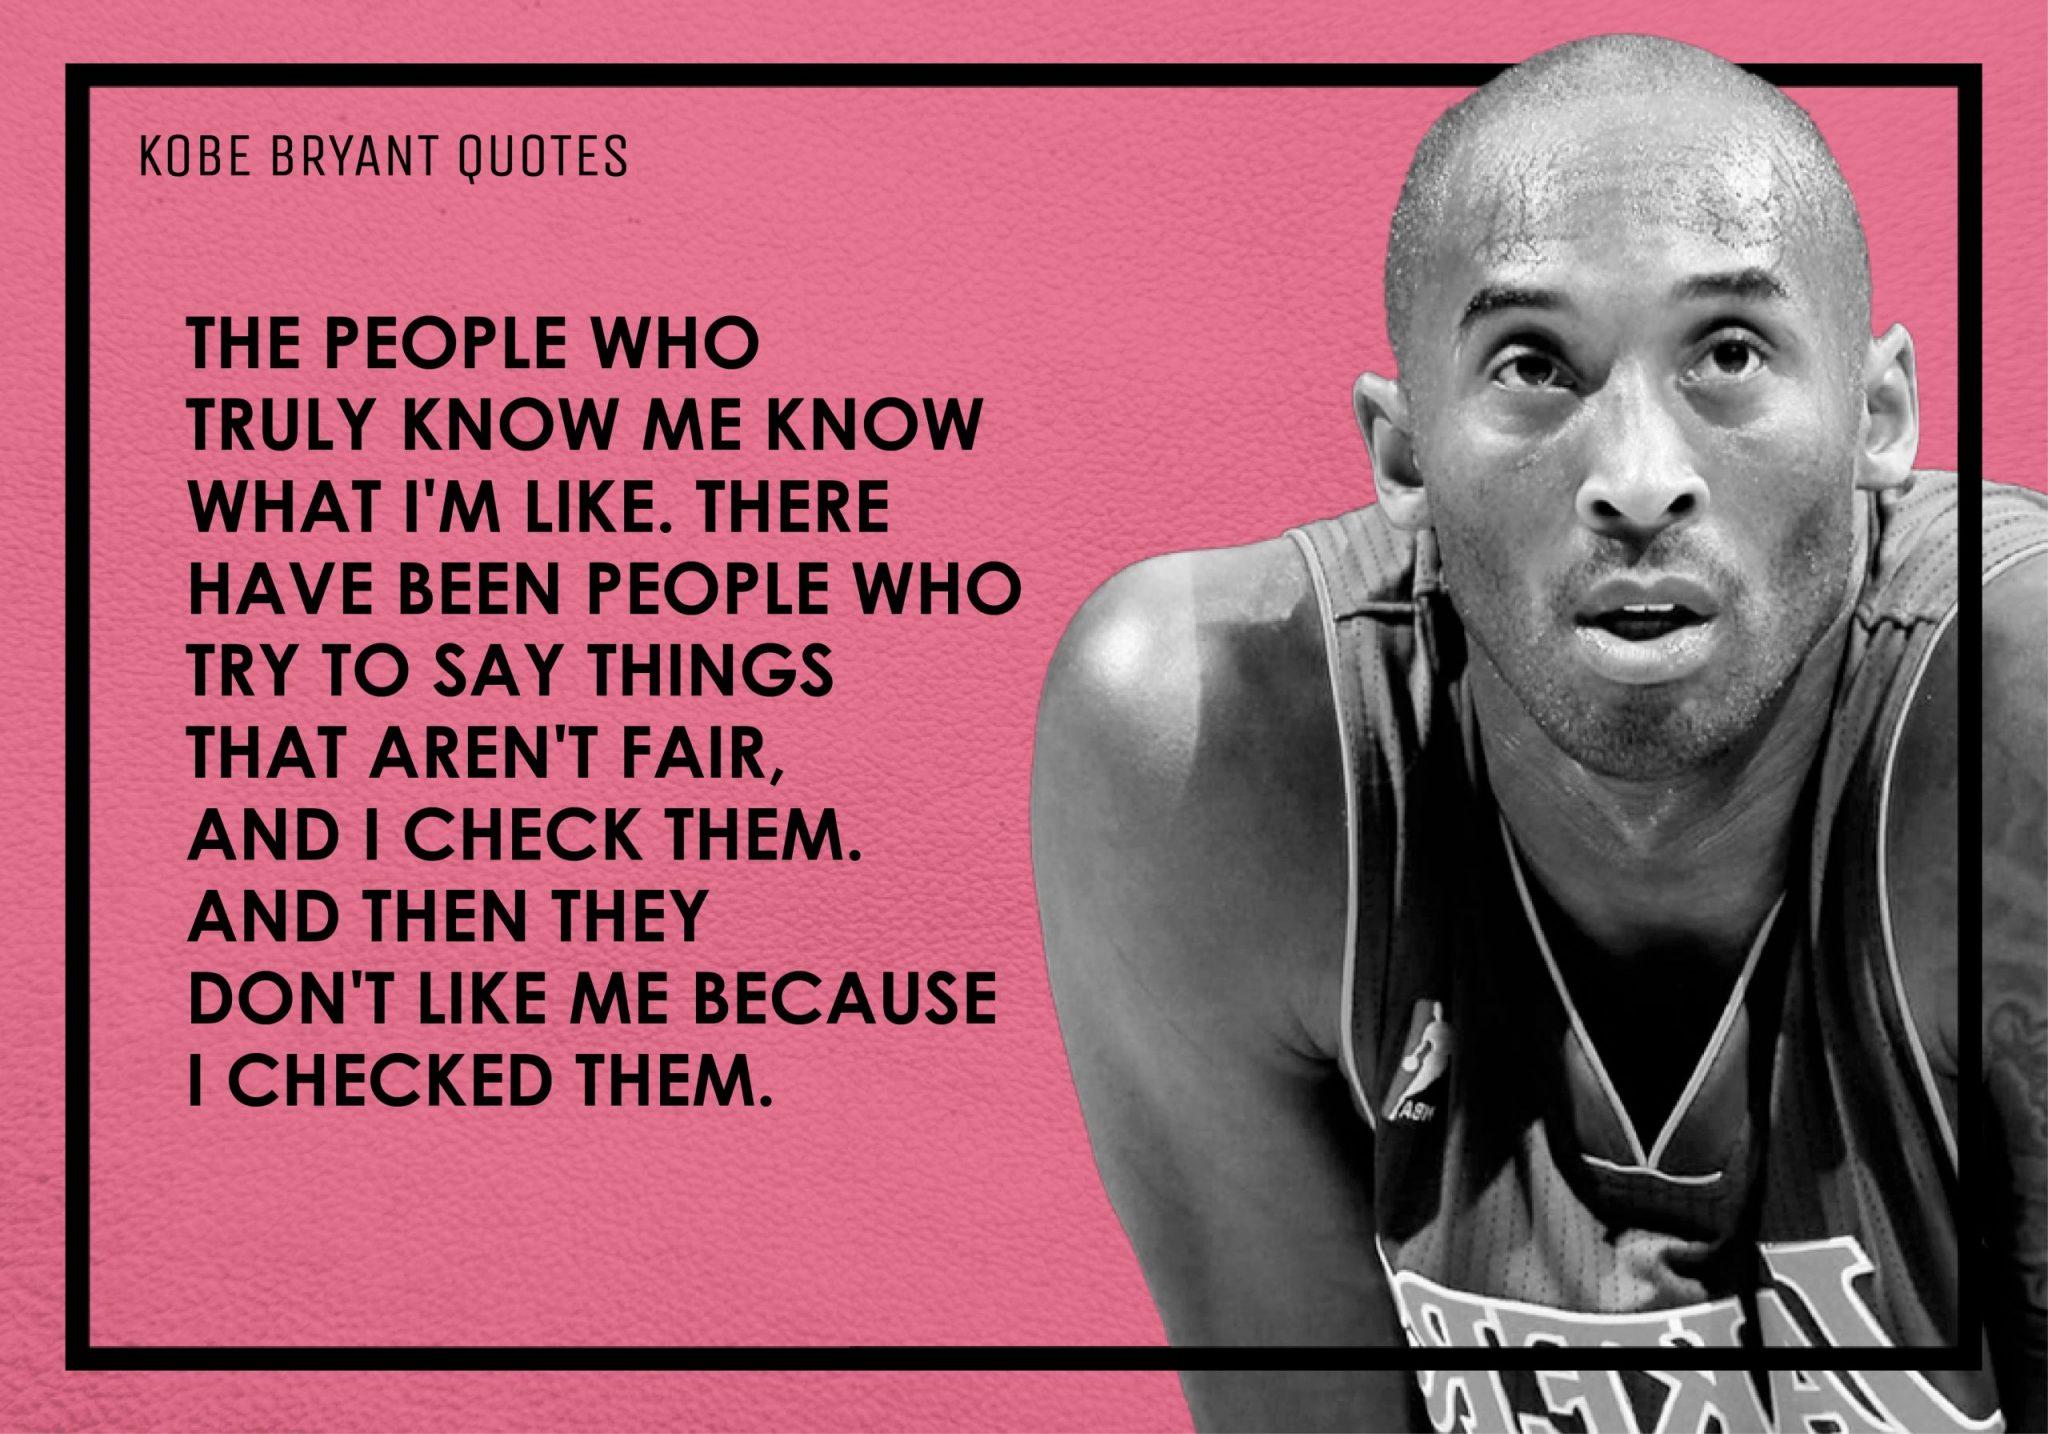 Kobe Bryant Quotes (8)